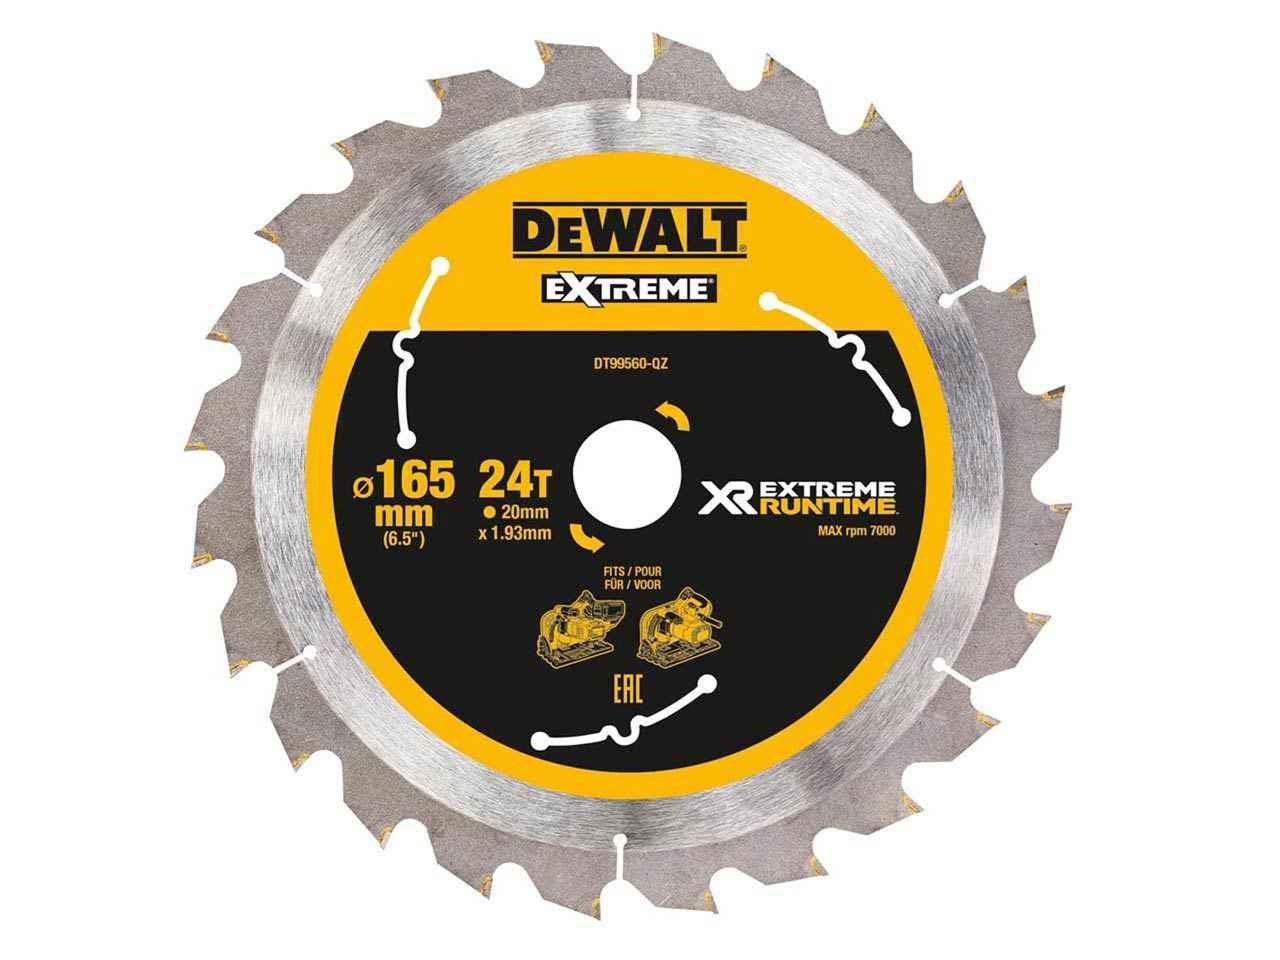 Dewalt DT99567QZ 210mm x 30mm 60T FlexVolt Xtreme Runtime Saw Blade